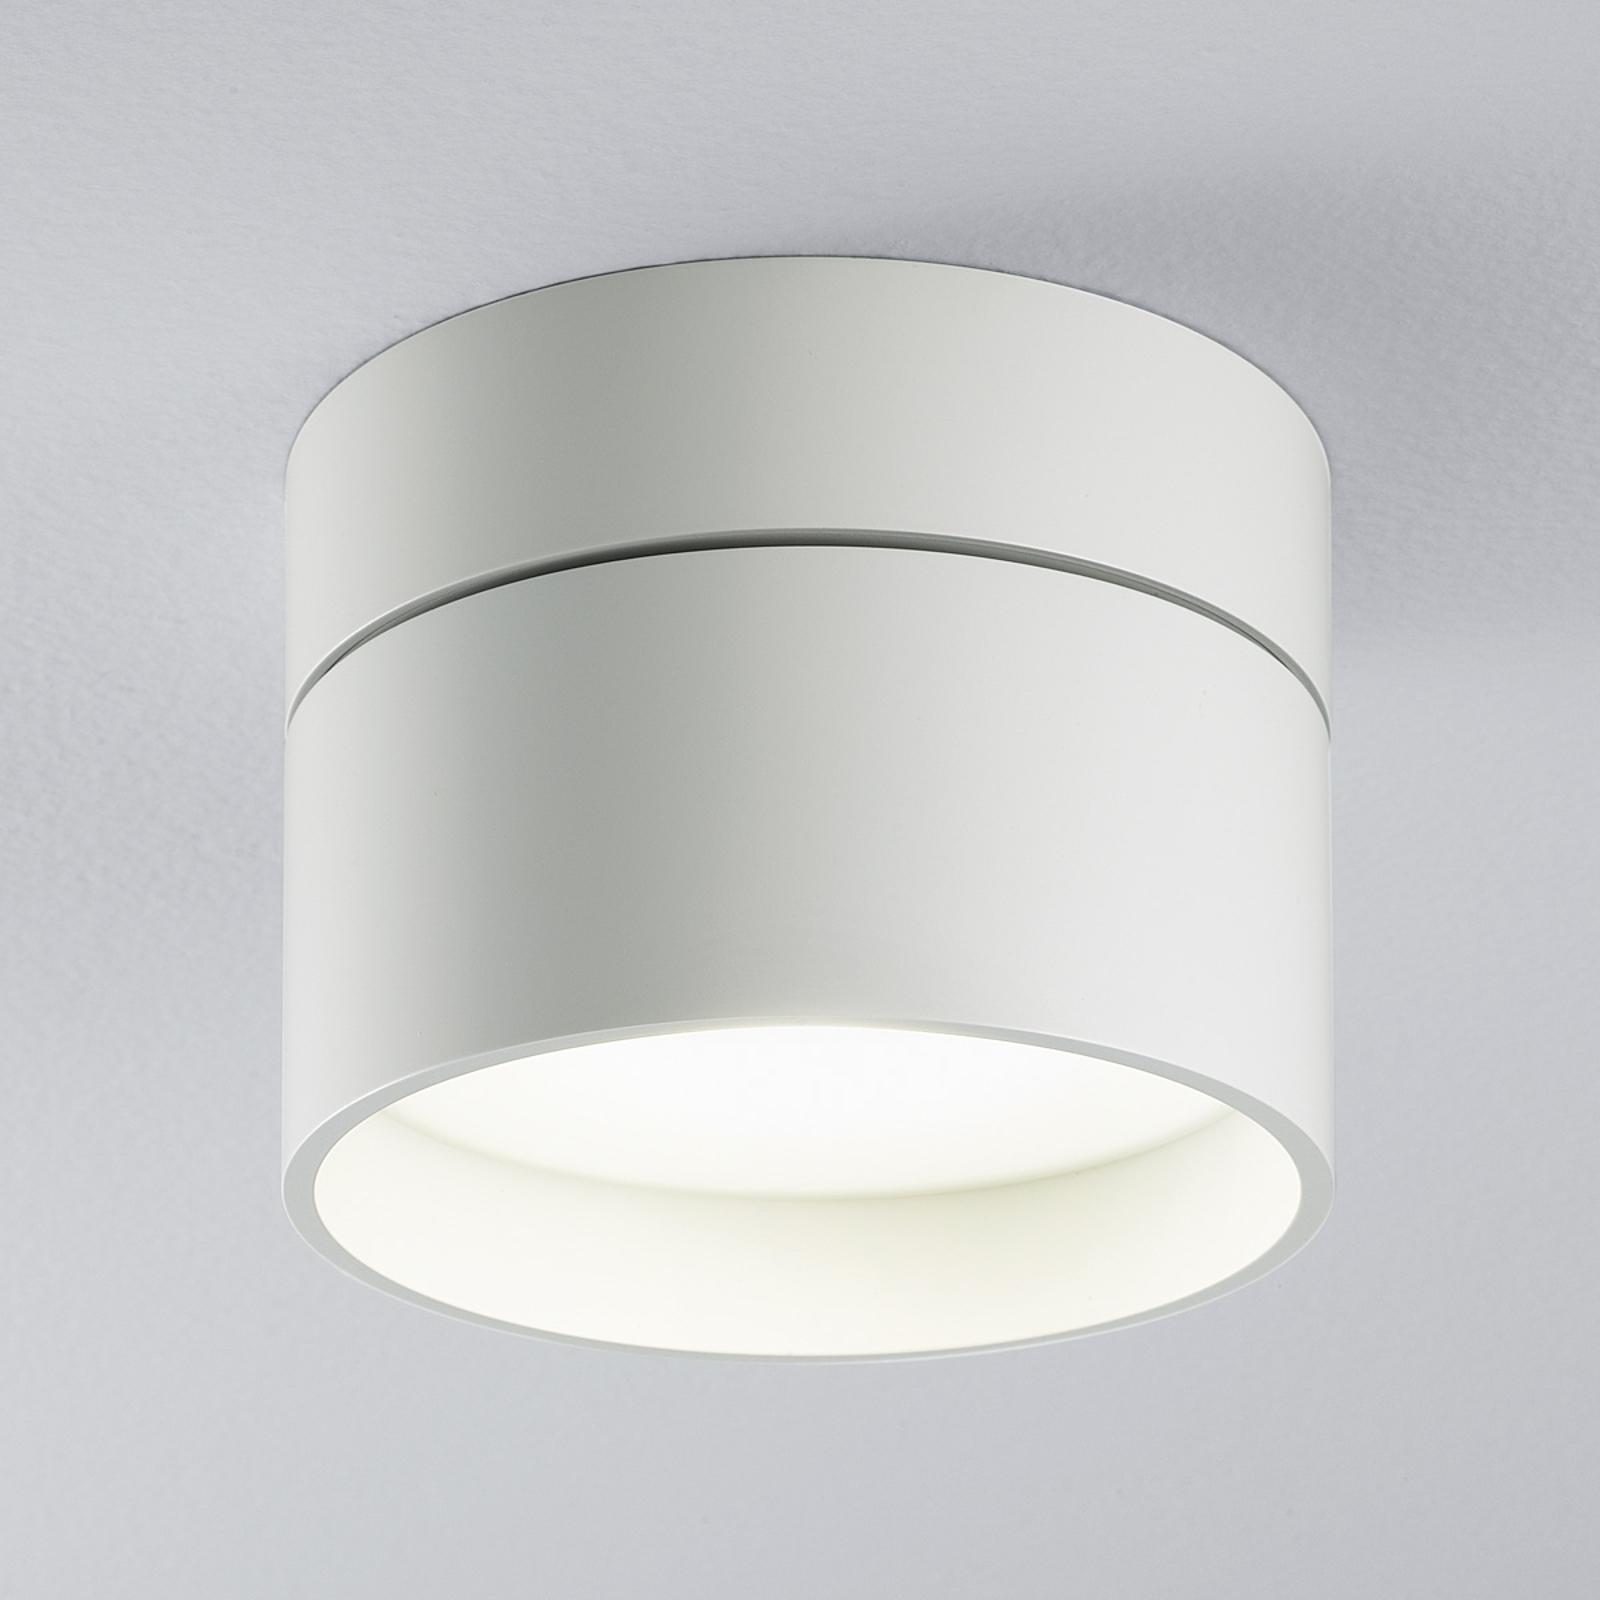 Lampa sufitowa LED Piper, 15 cm